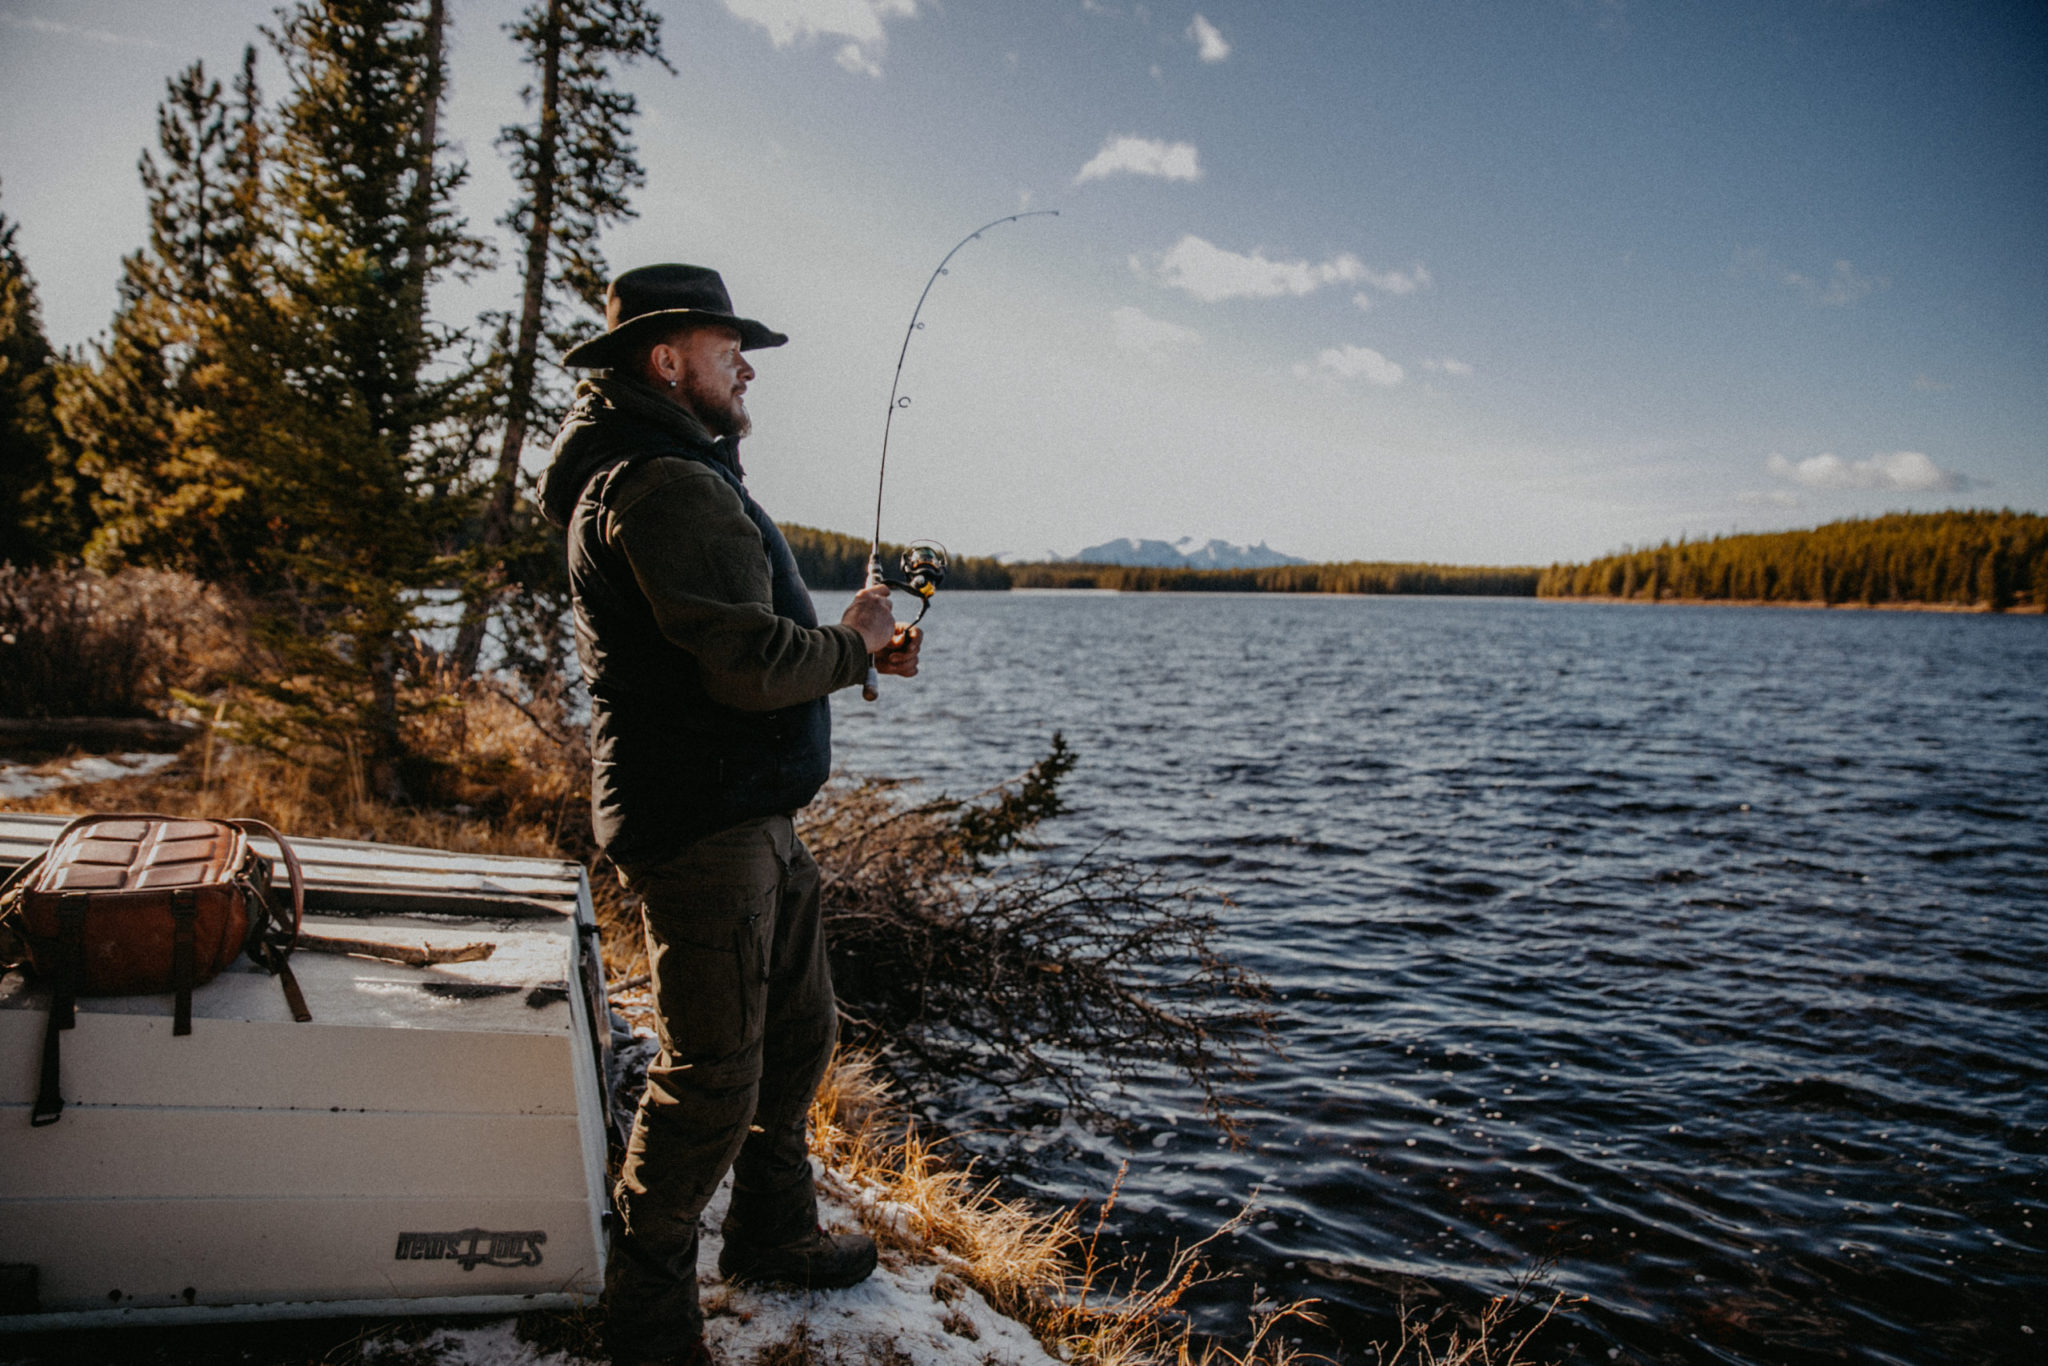 Short stay ranch break in Canada: BC fishing trip in Cariboo